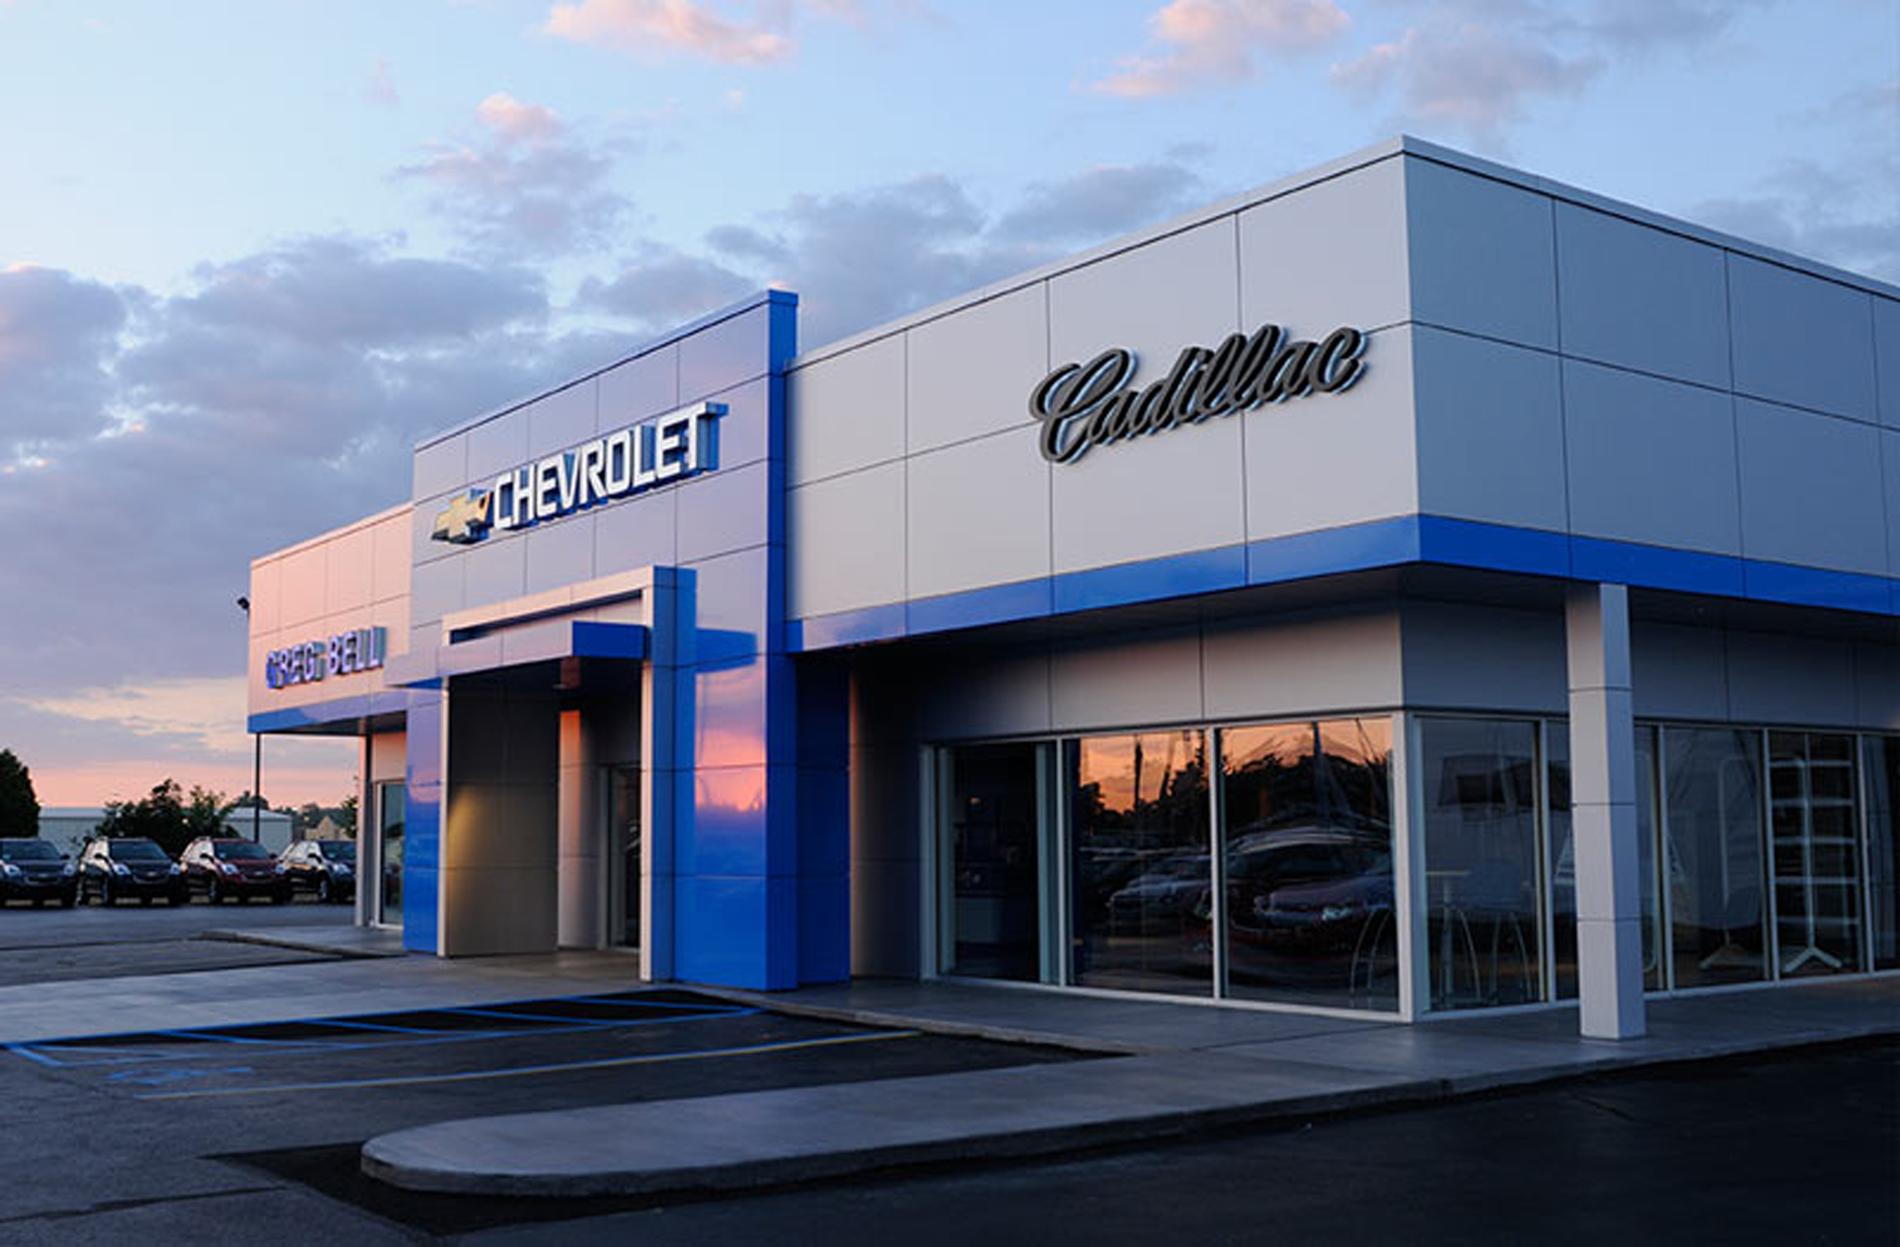 Greg Bell Chevrolet: Corporate